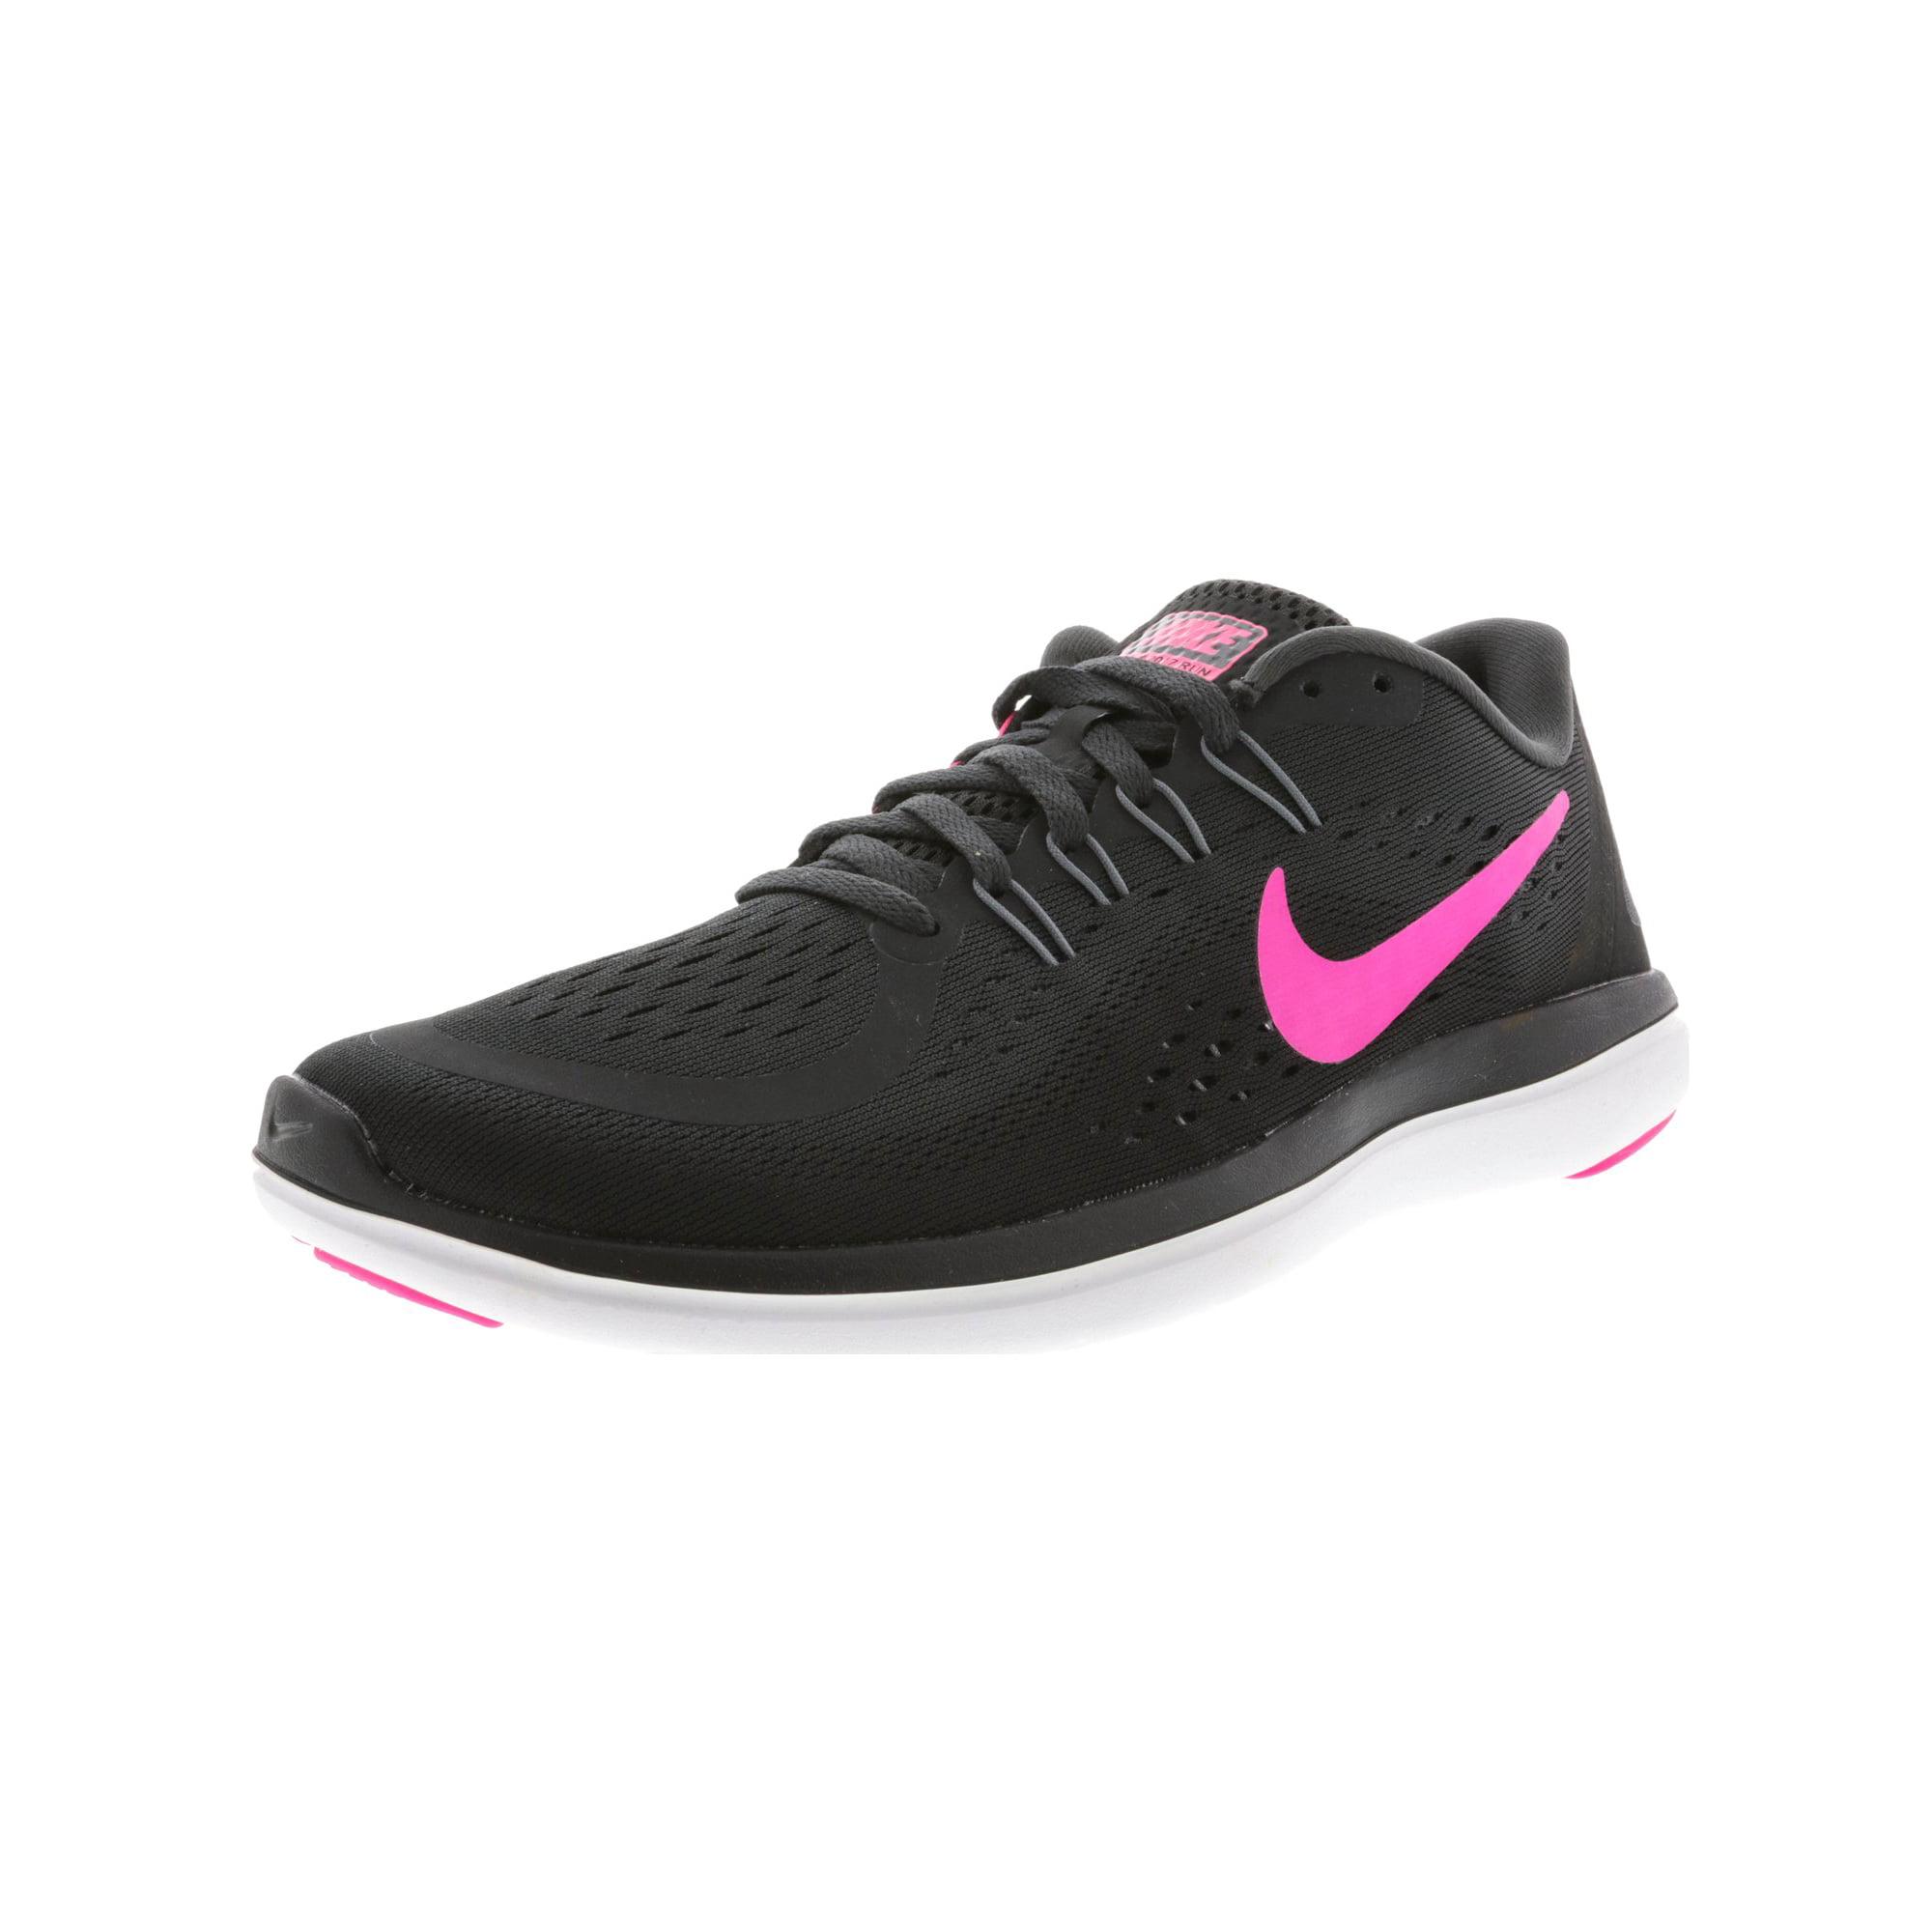 fc5b2ae6a701f Nike Women s Flex 2017 Rn White   Metallic Silver Ankle-High Cross Country  Running Shoe - 7M